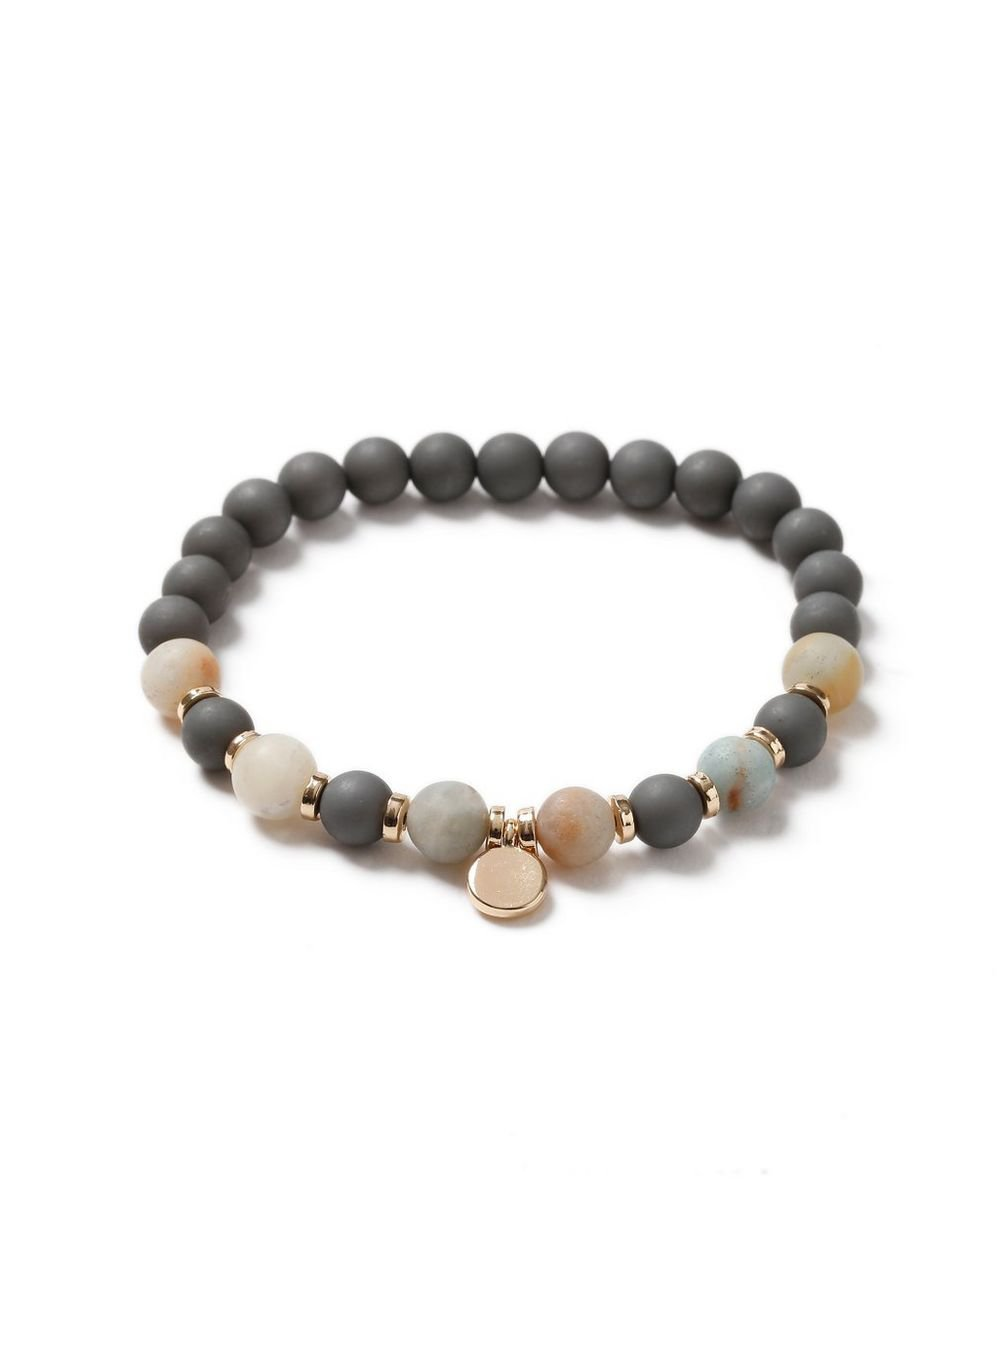 Gray Beaded Stretch Bracelet* - TOPMAN USA